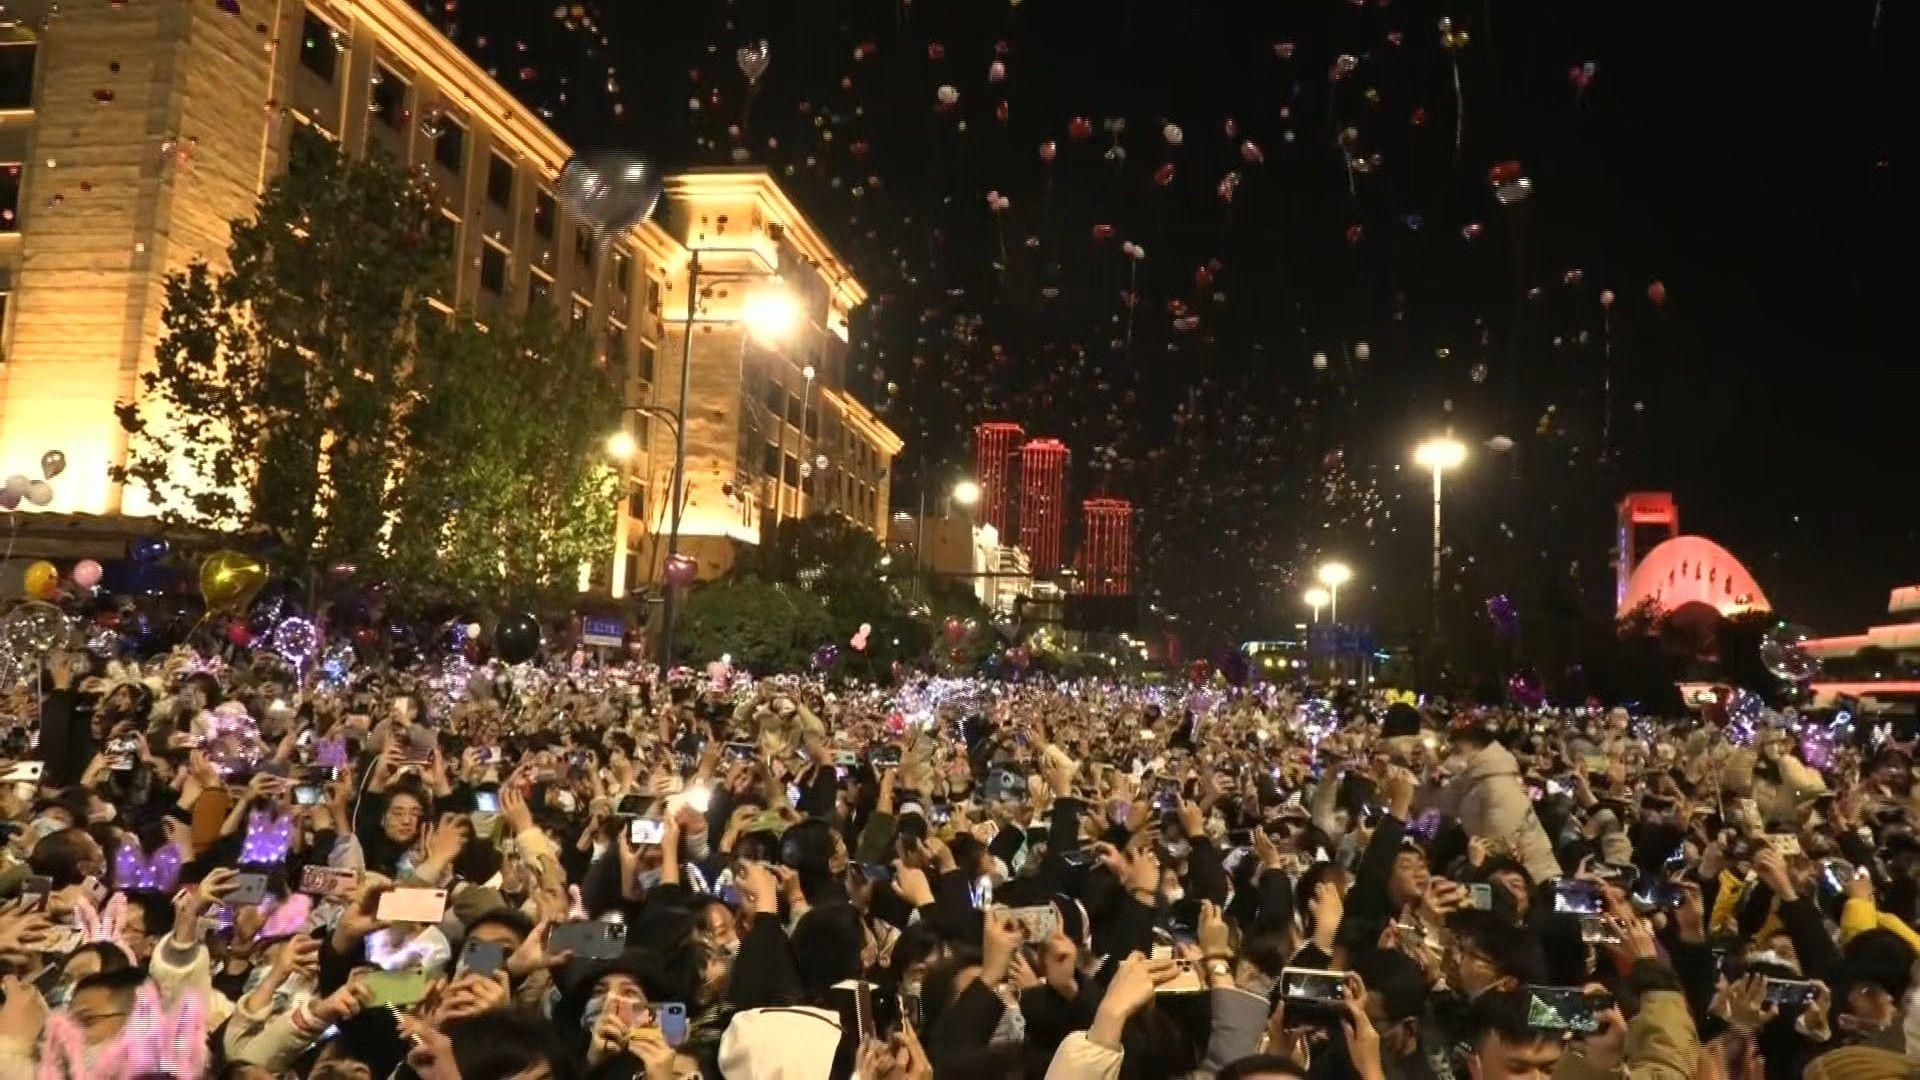 Silvester im Ursprungsort der Corona-Pandemie: Wuhan begrüßt 2021